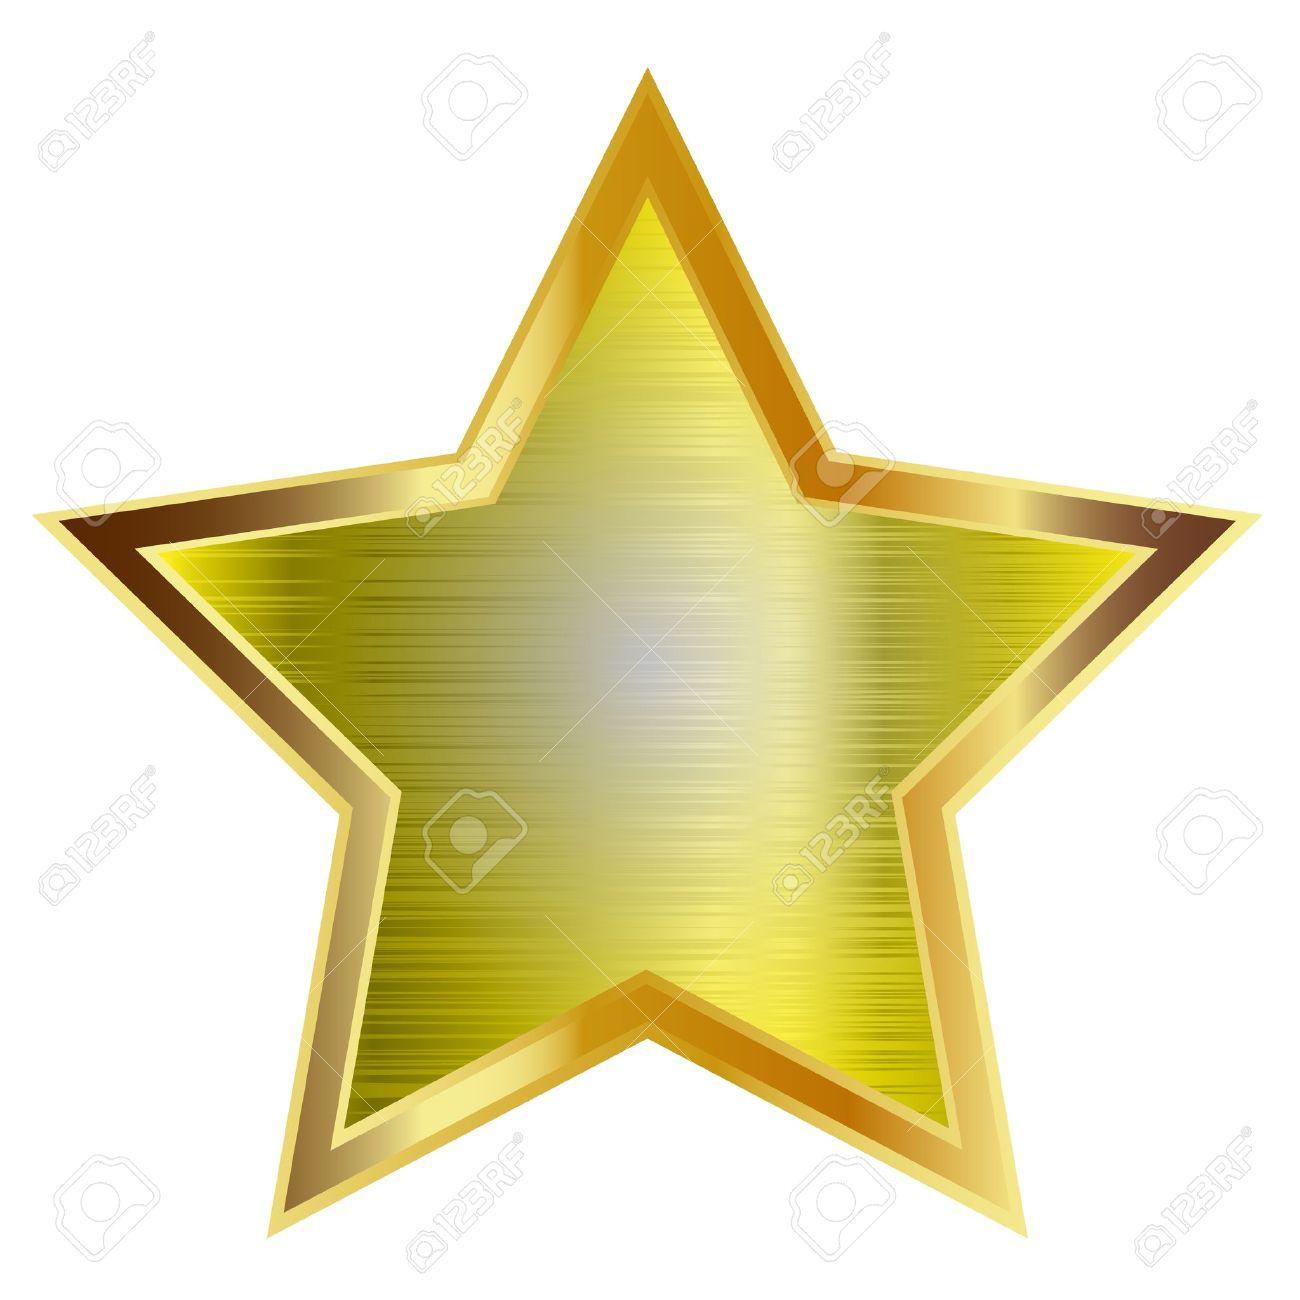 Gold star isolated on white background. Vector. Standard-Bild - 18245239